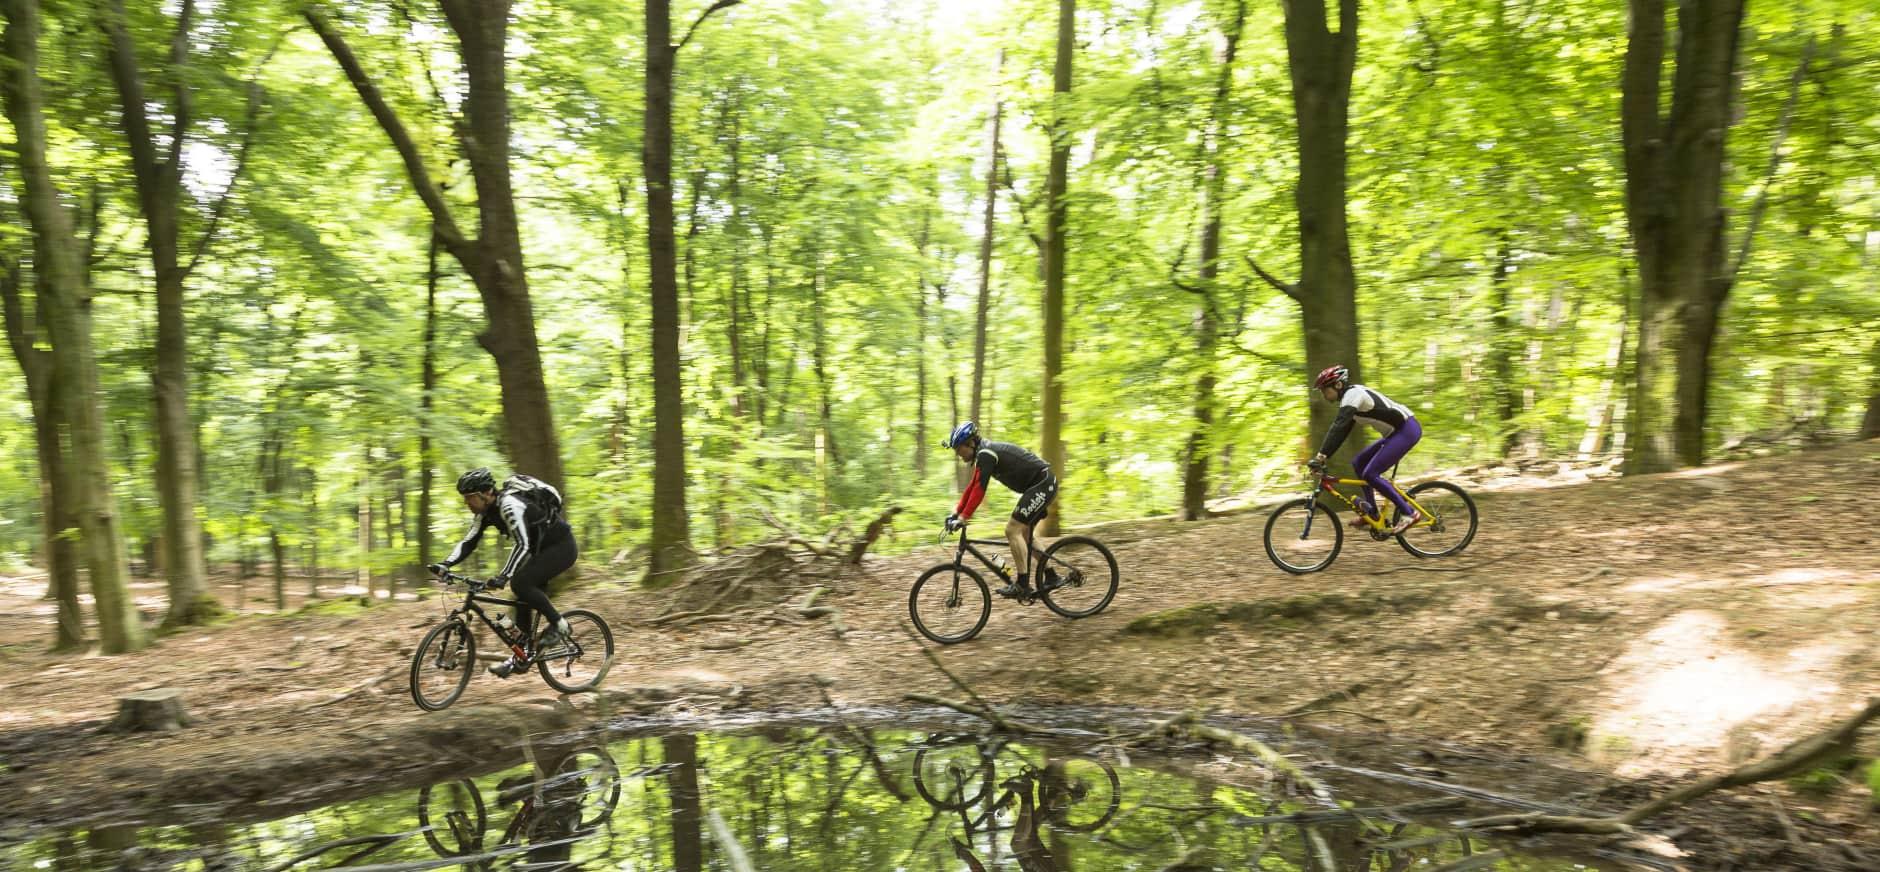 Mountainbiken in Nationaal Park Veluwezoom